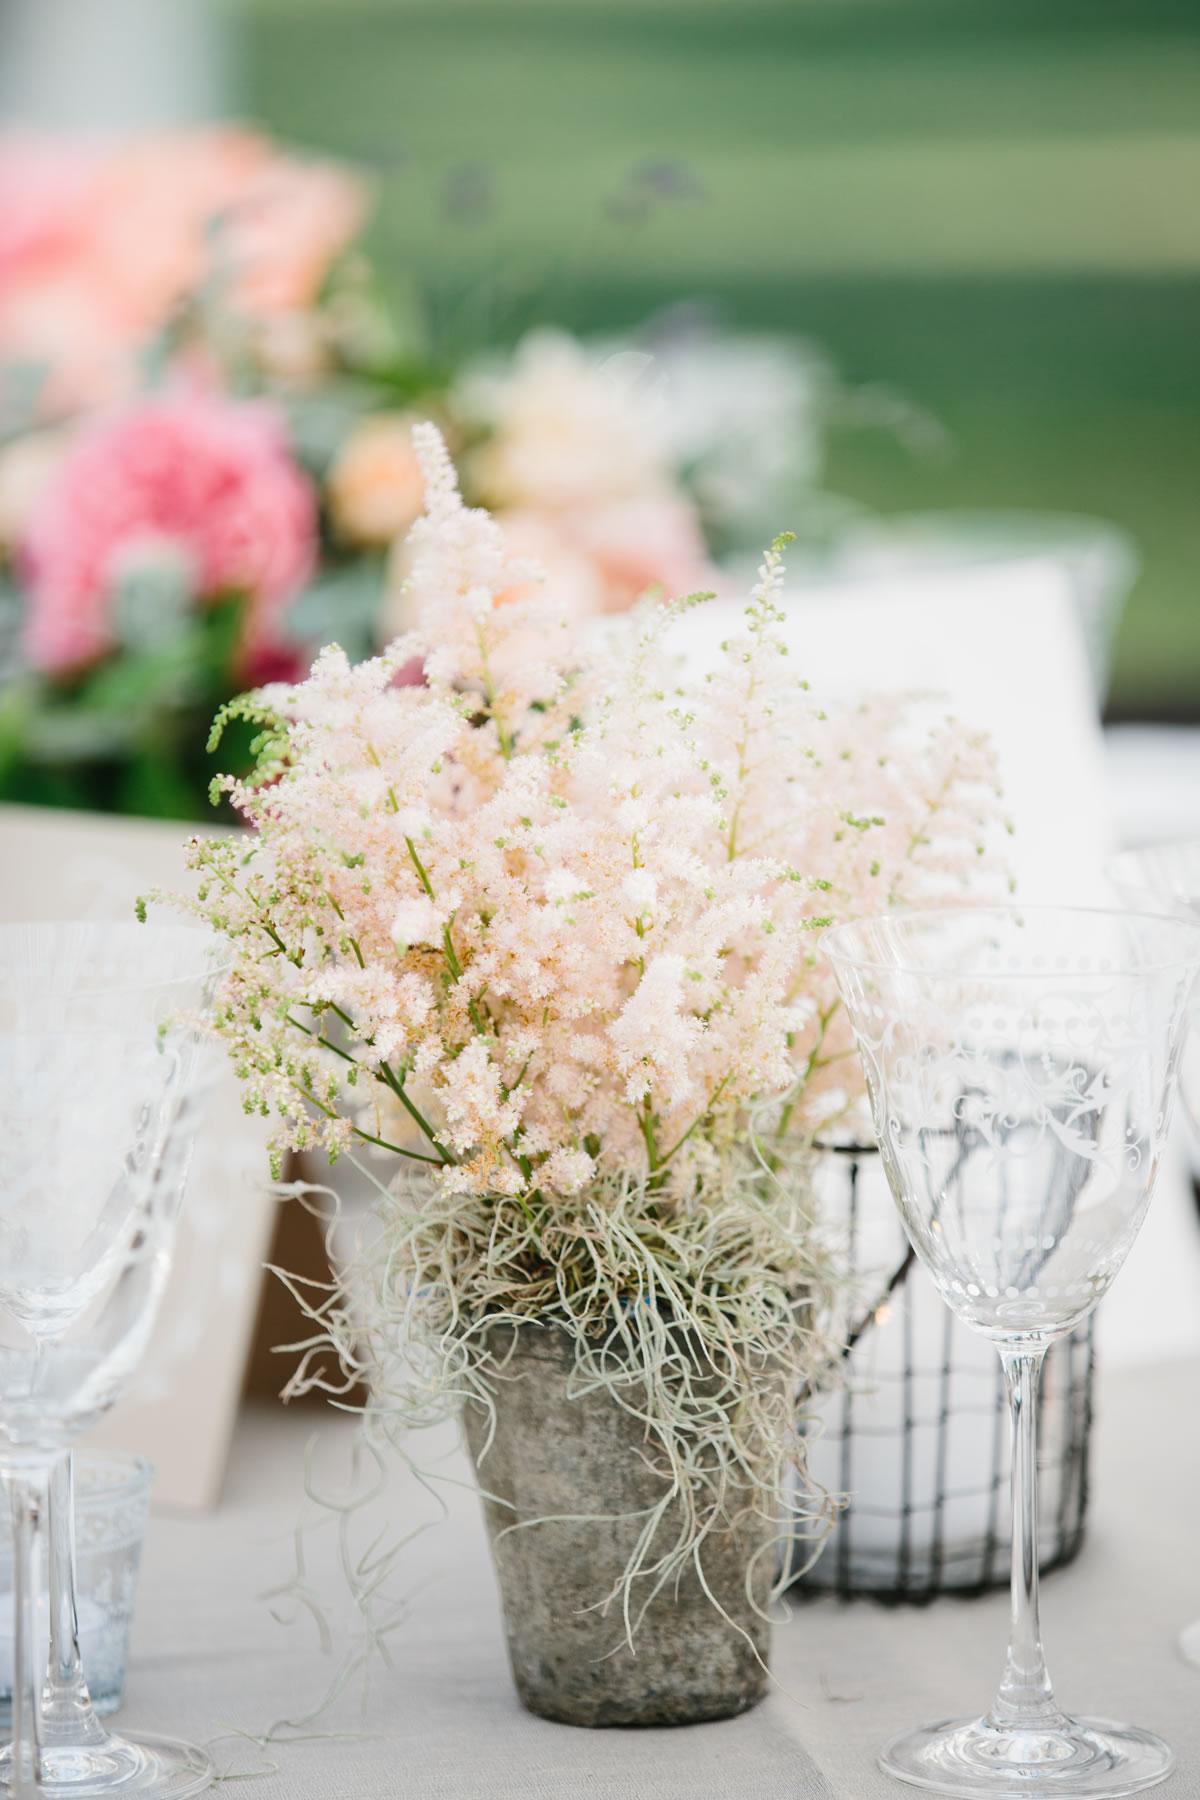 XOXO-BRIDE-Marianne-Wilson-Photography-JD-Details-105-3351851140-O